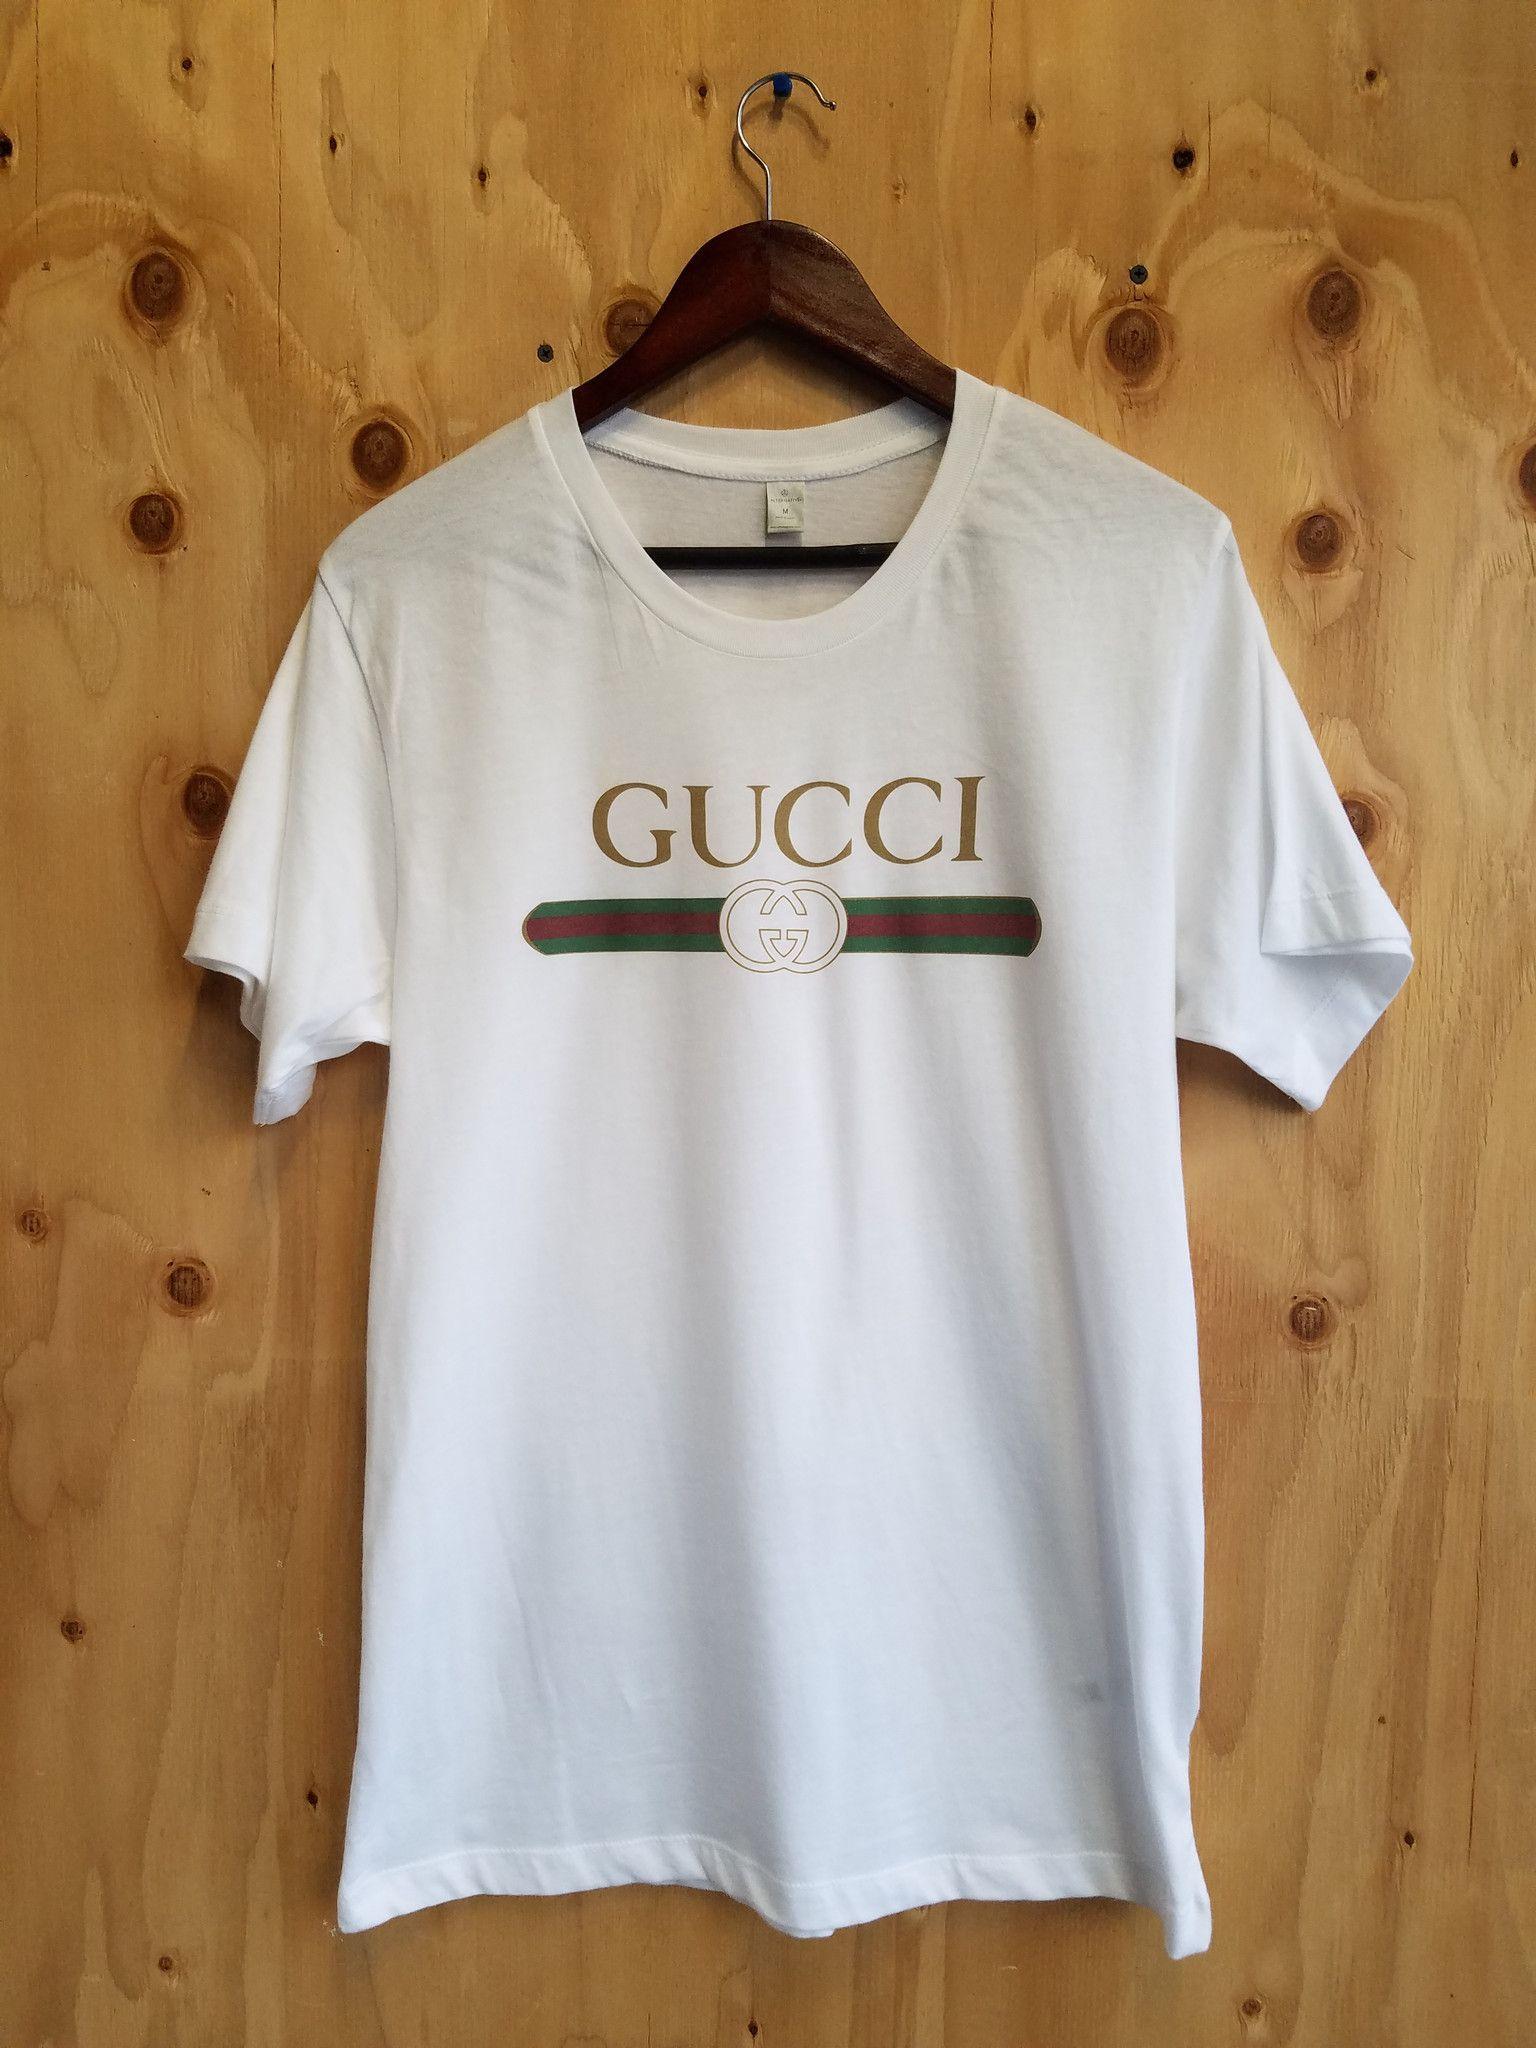 3b6f69e4a Organic Gucci Bootleg T-Shirt | california ootds | Gucci shirts ...